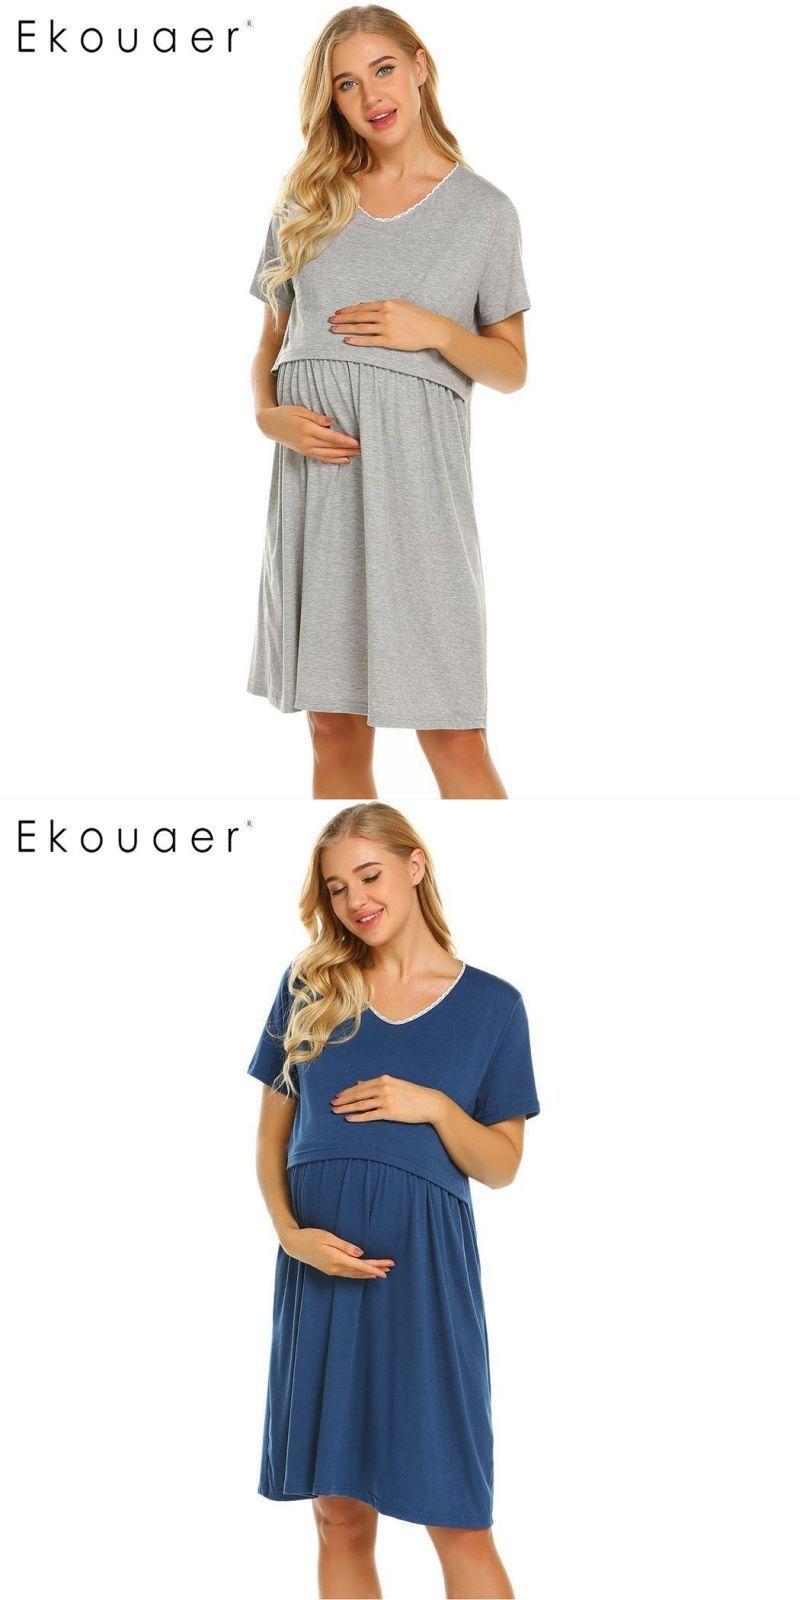 5808c842487 Women nightgowns soft cotton sleepwear dress casual short sleeve two layers maternity  nursing breastfeeding nightdress